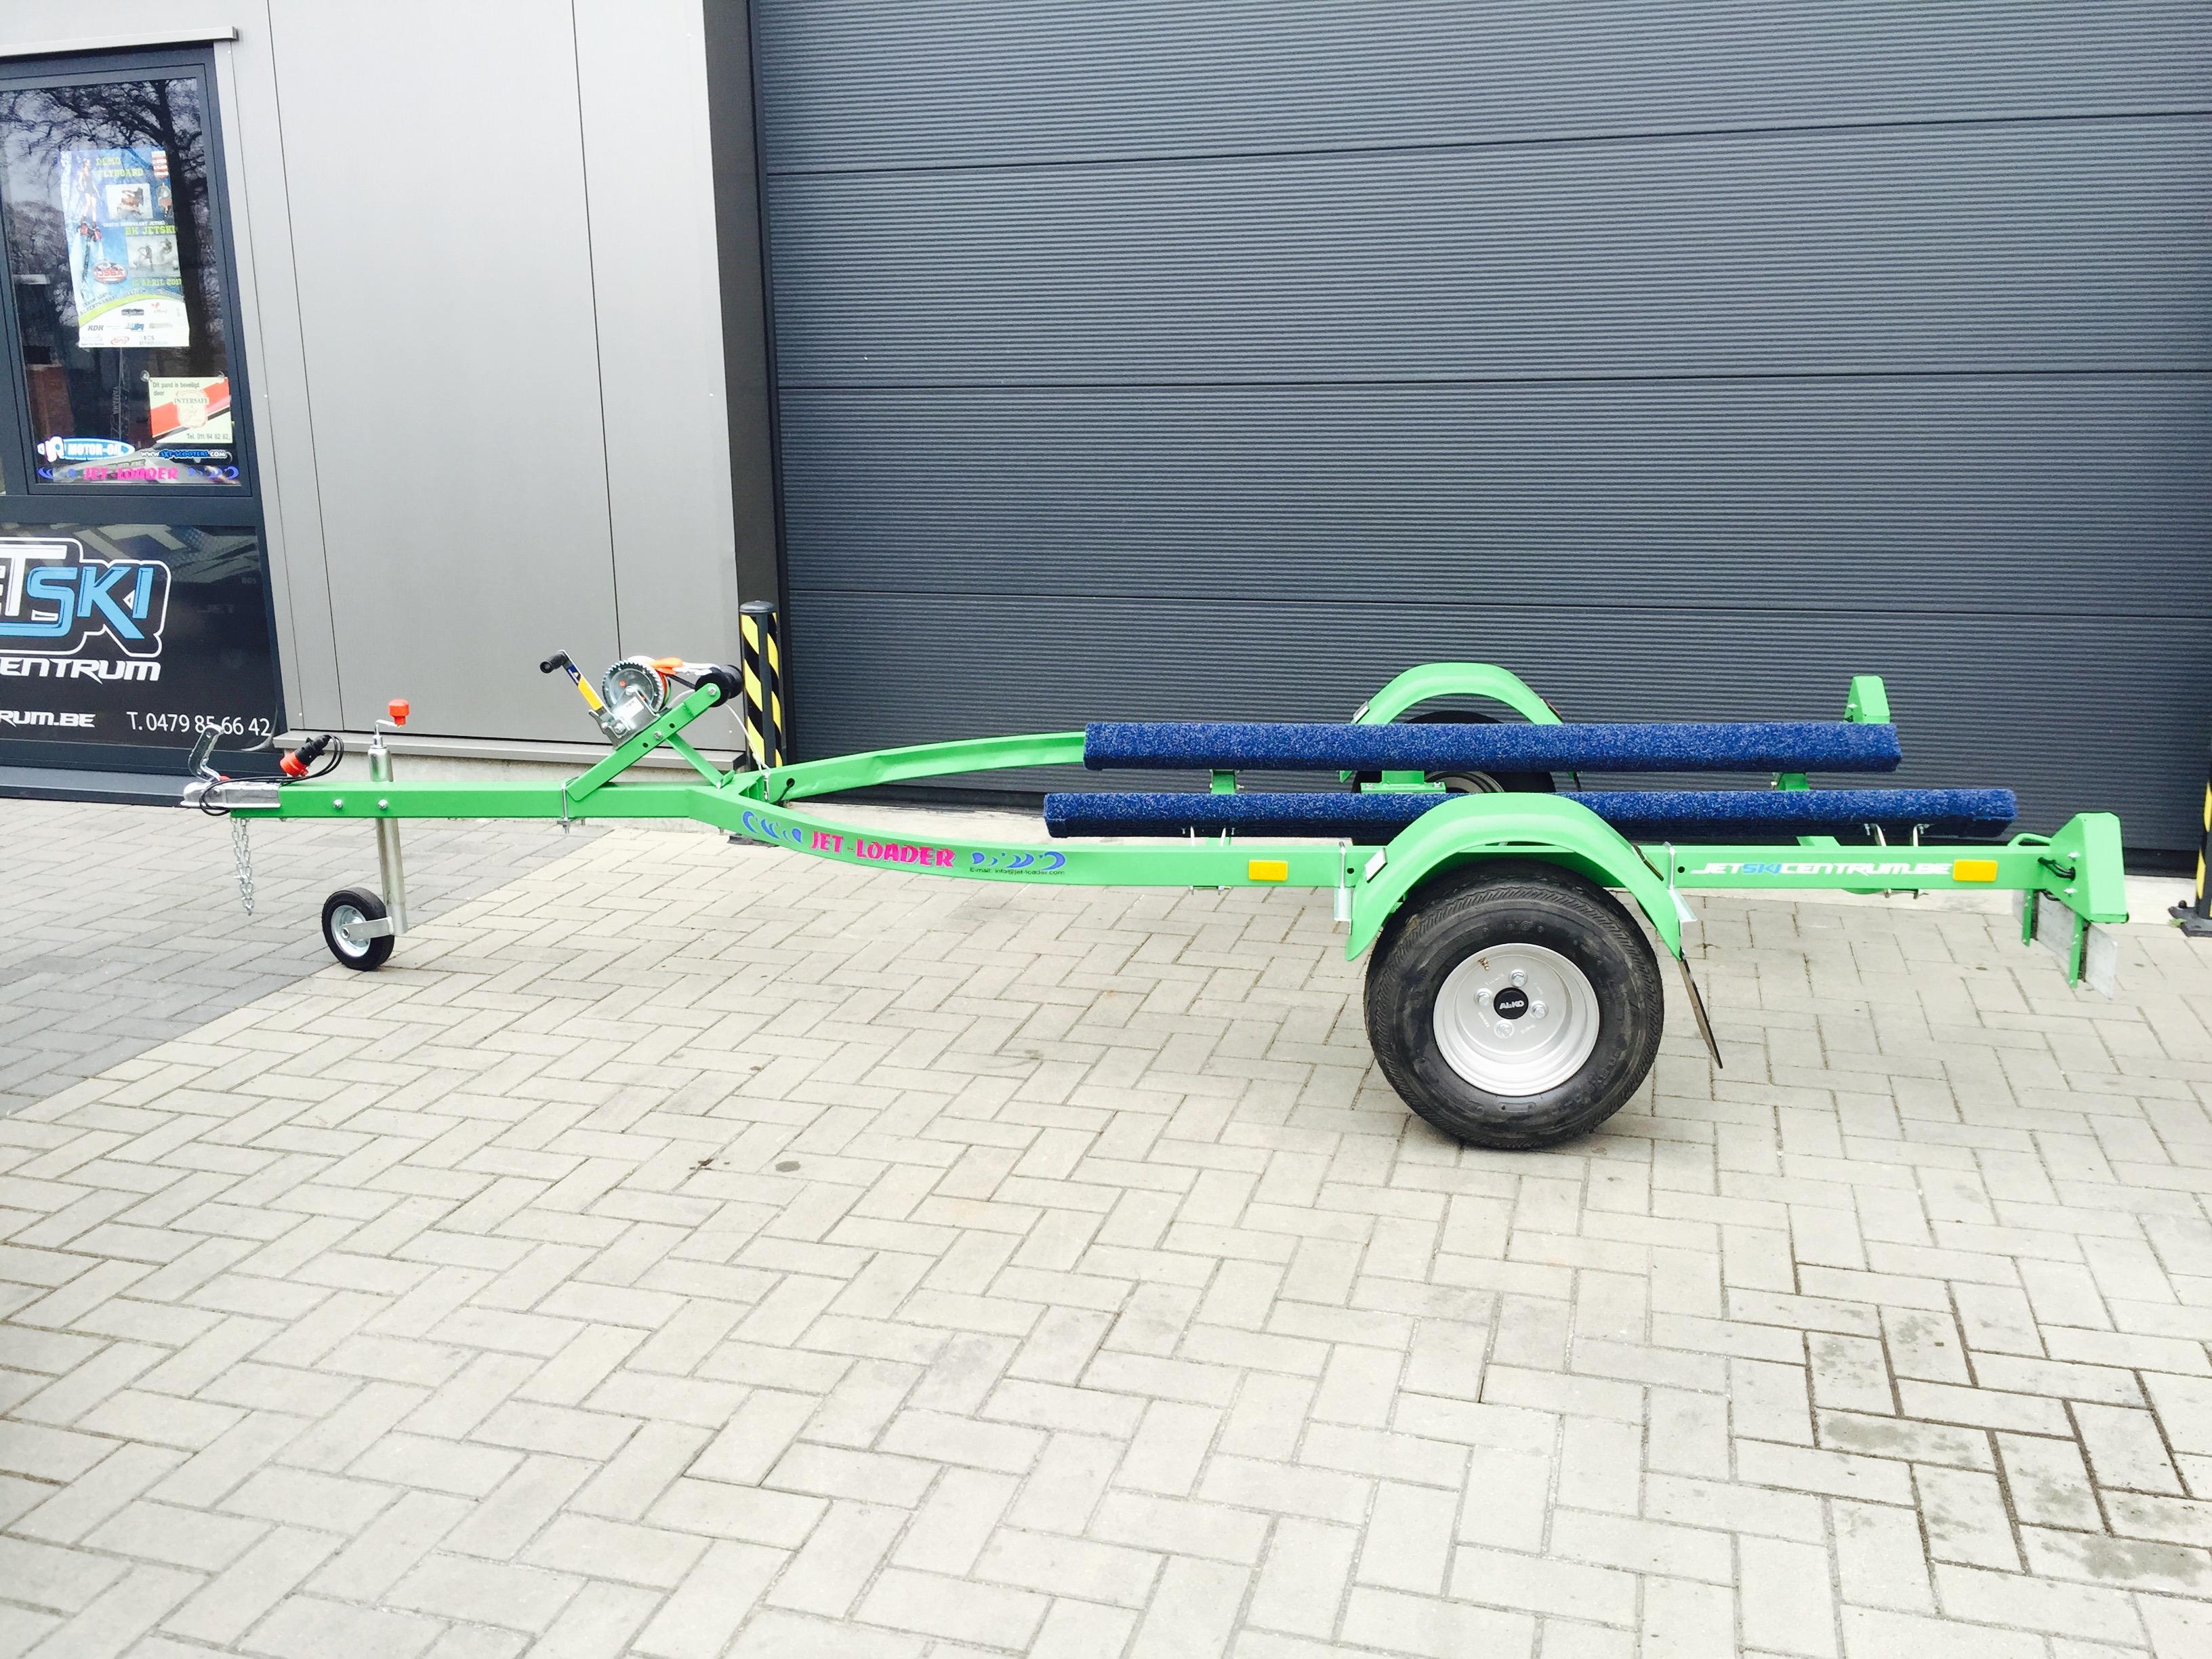 Jet-loader standaard kawasaki groen Image